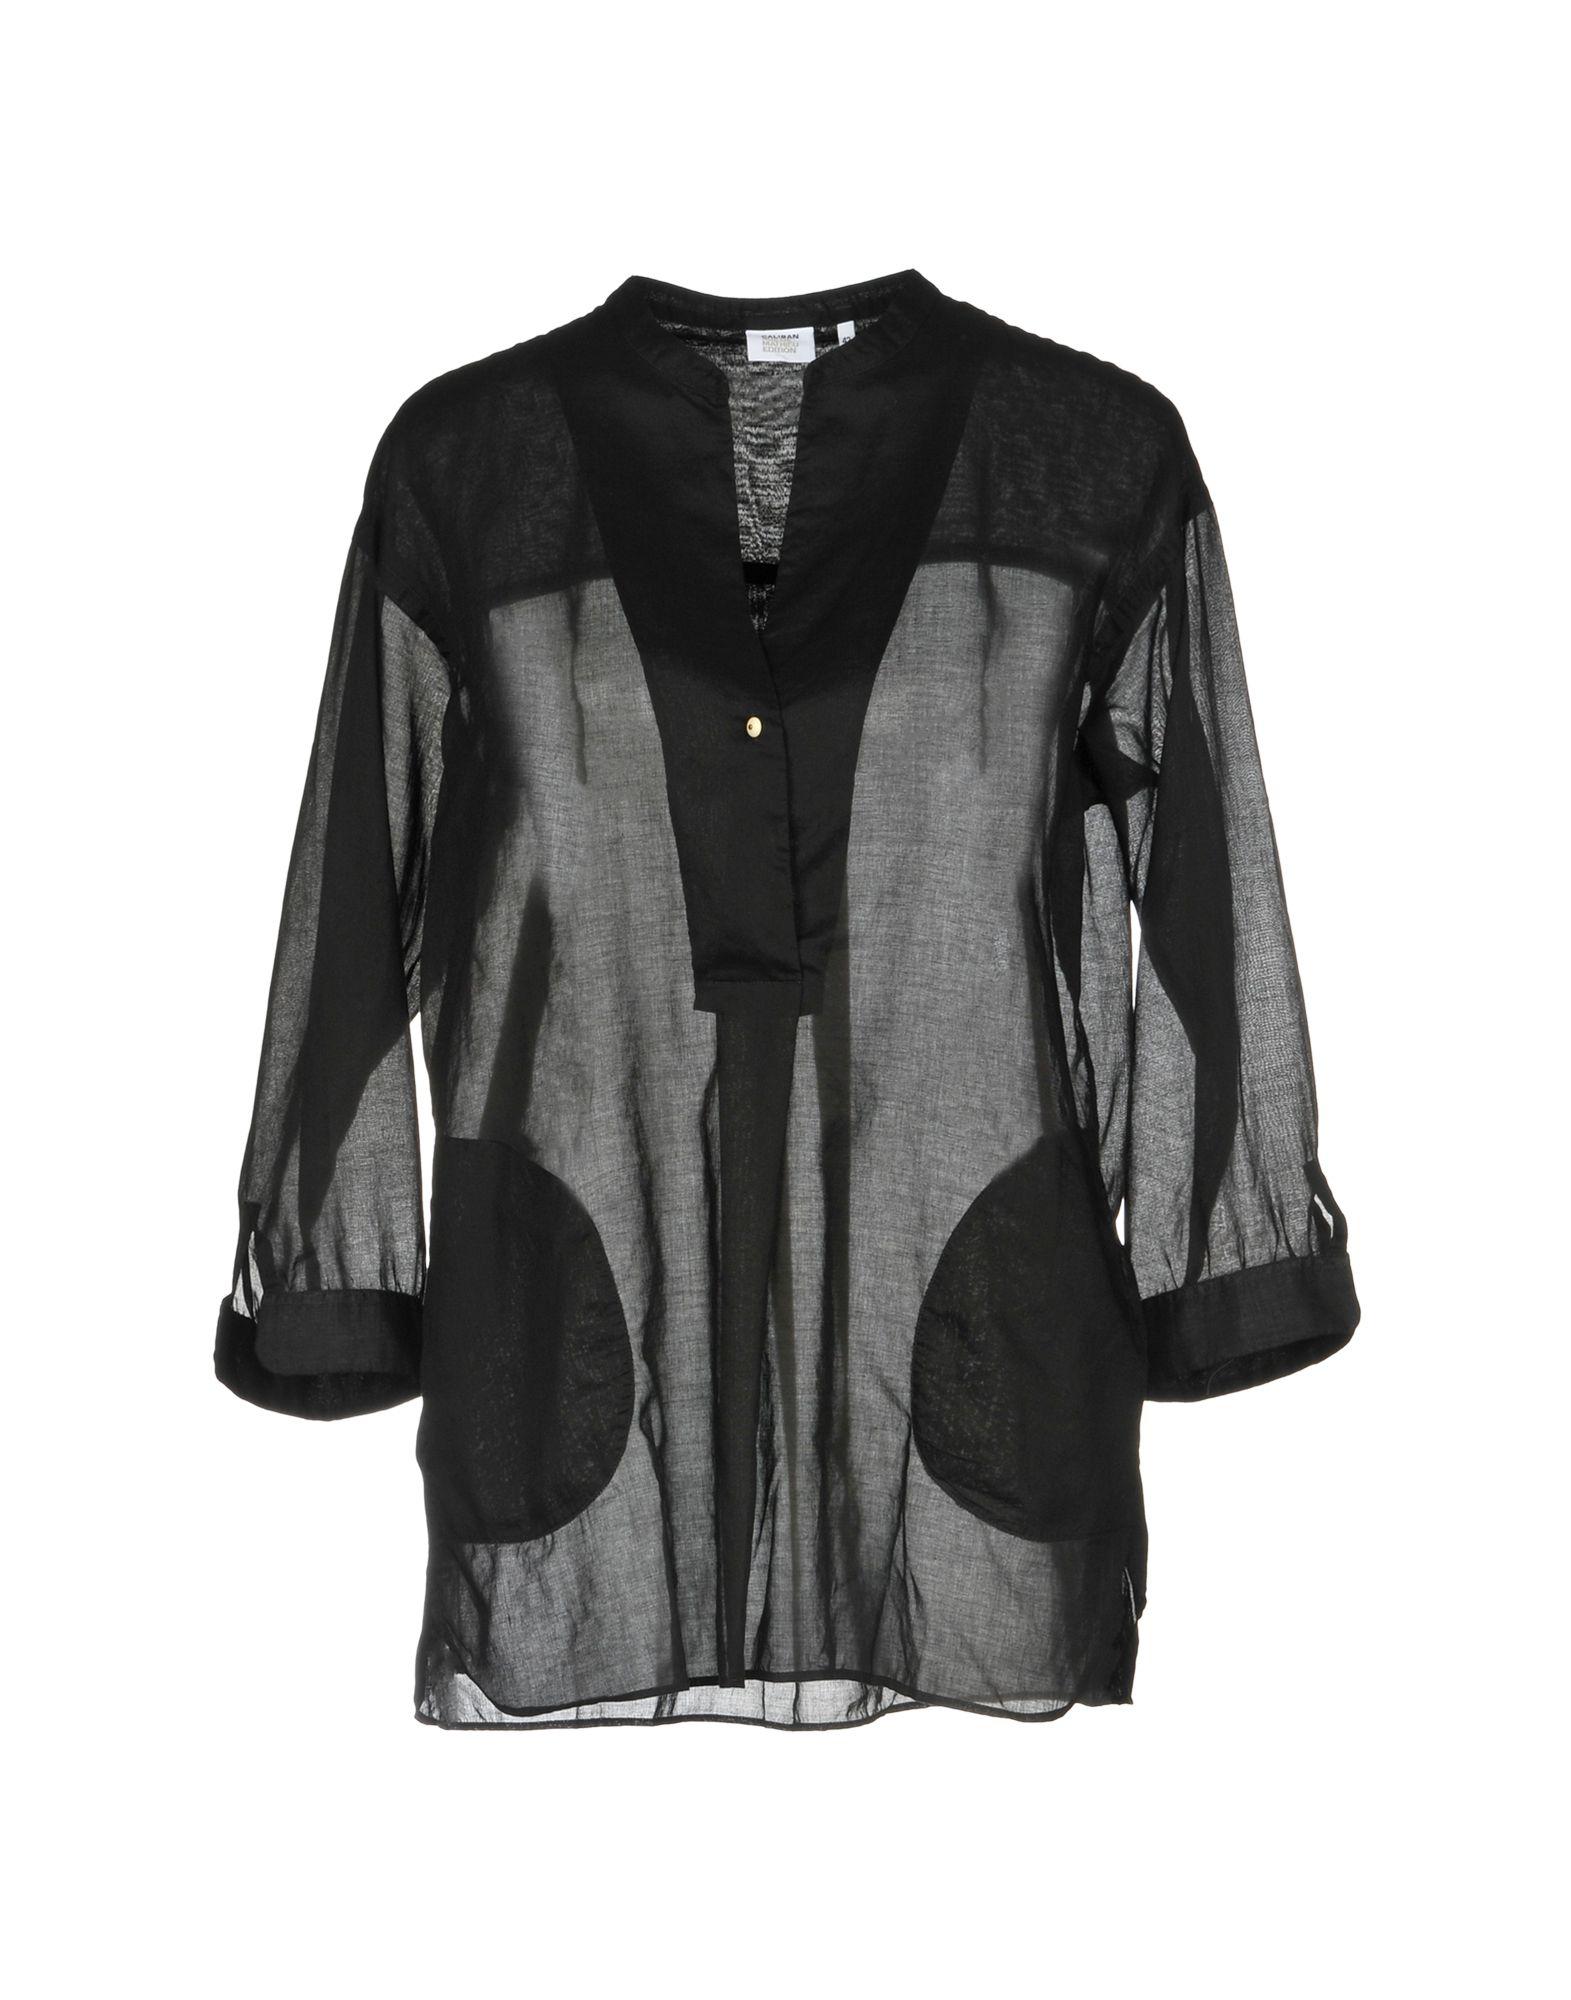 CALIBAN RUE DE MATHIEU EDITION Блузка v de vinster блузка